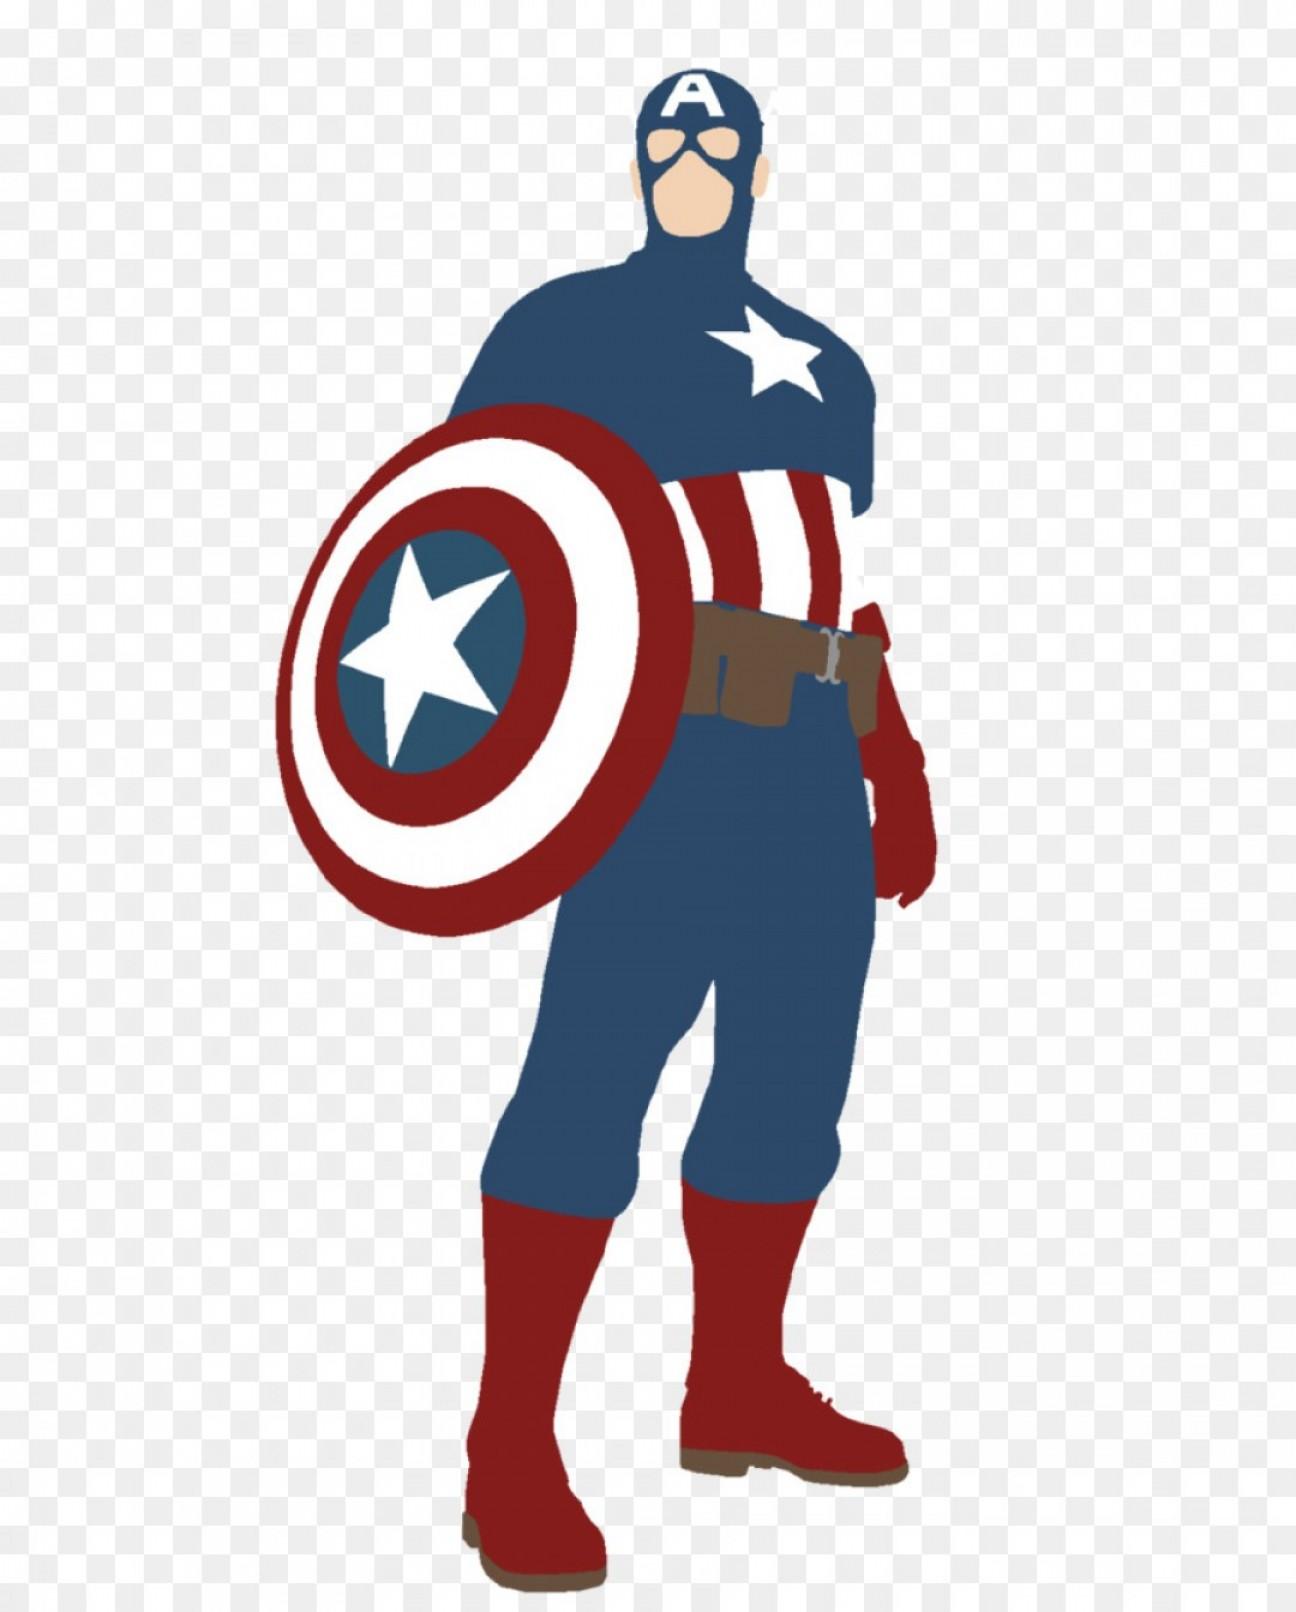 Captain america iron man clipart banner library download Png Captain America Iron Man Spider Man Superhero Silh | CQRecords banner library download